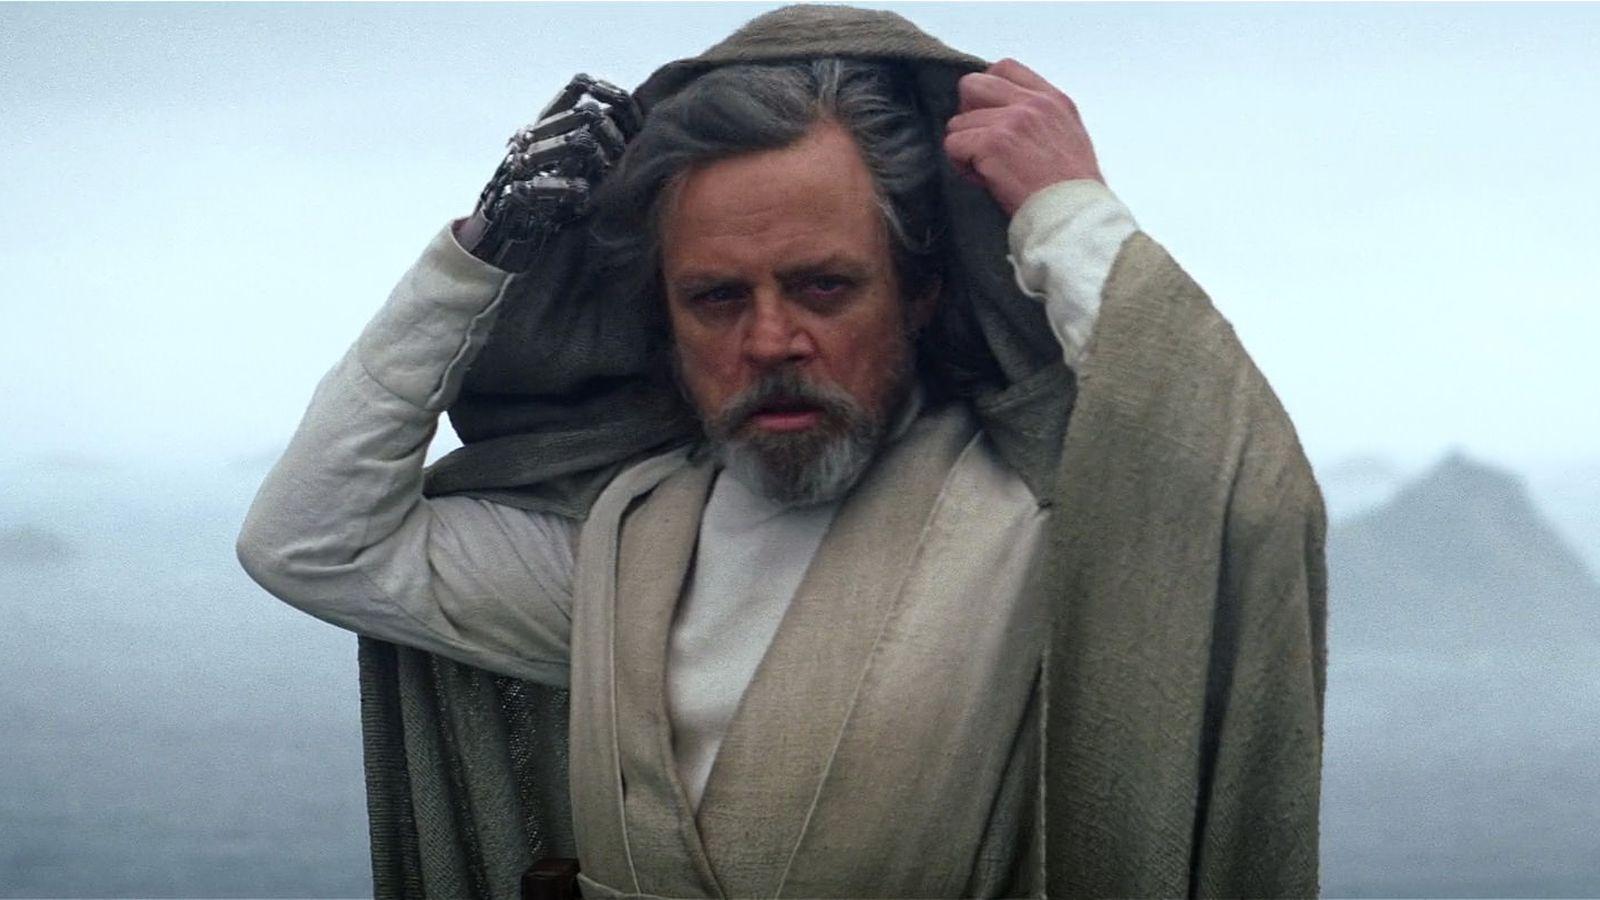 Star Wars: The Last Jedi's first footage shown